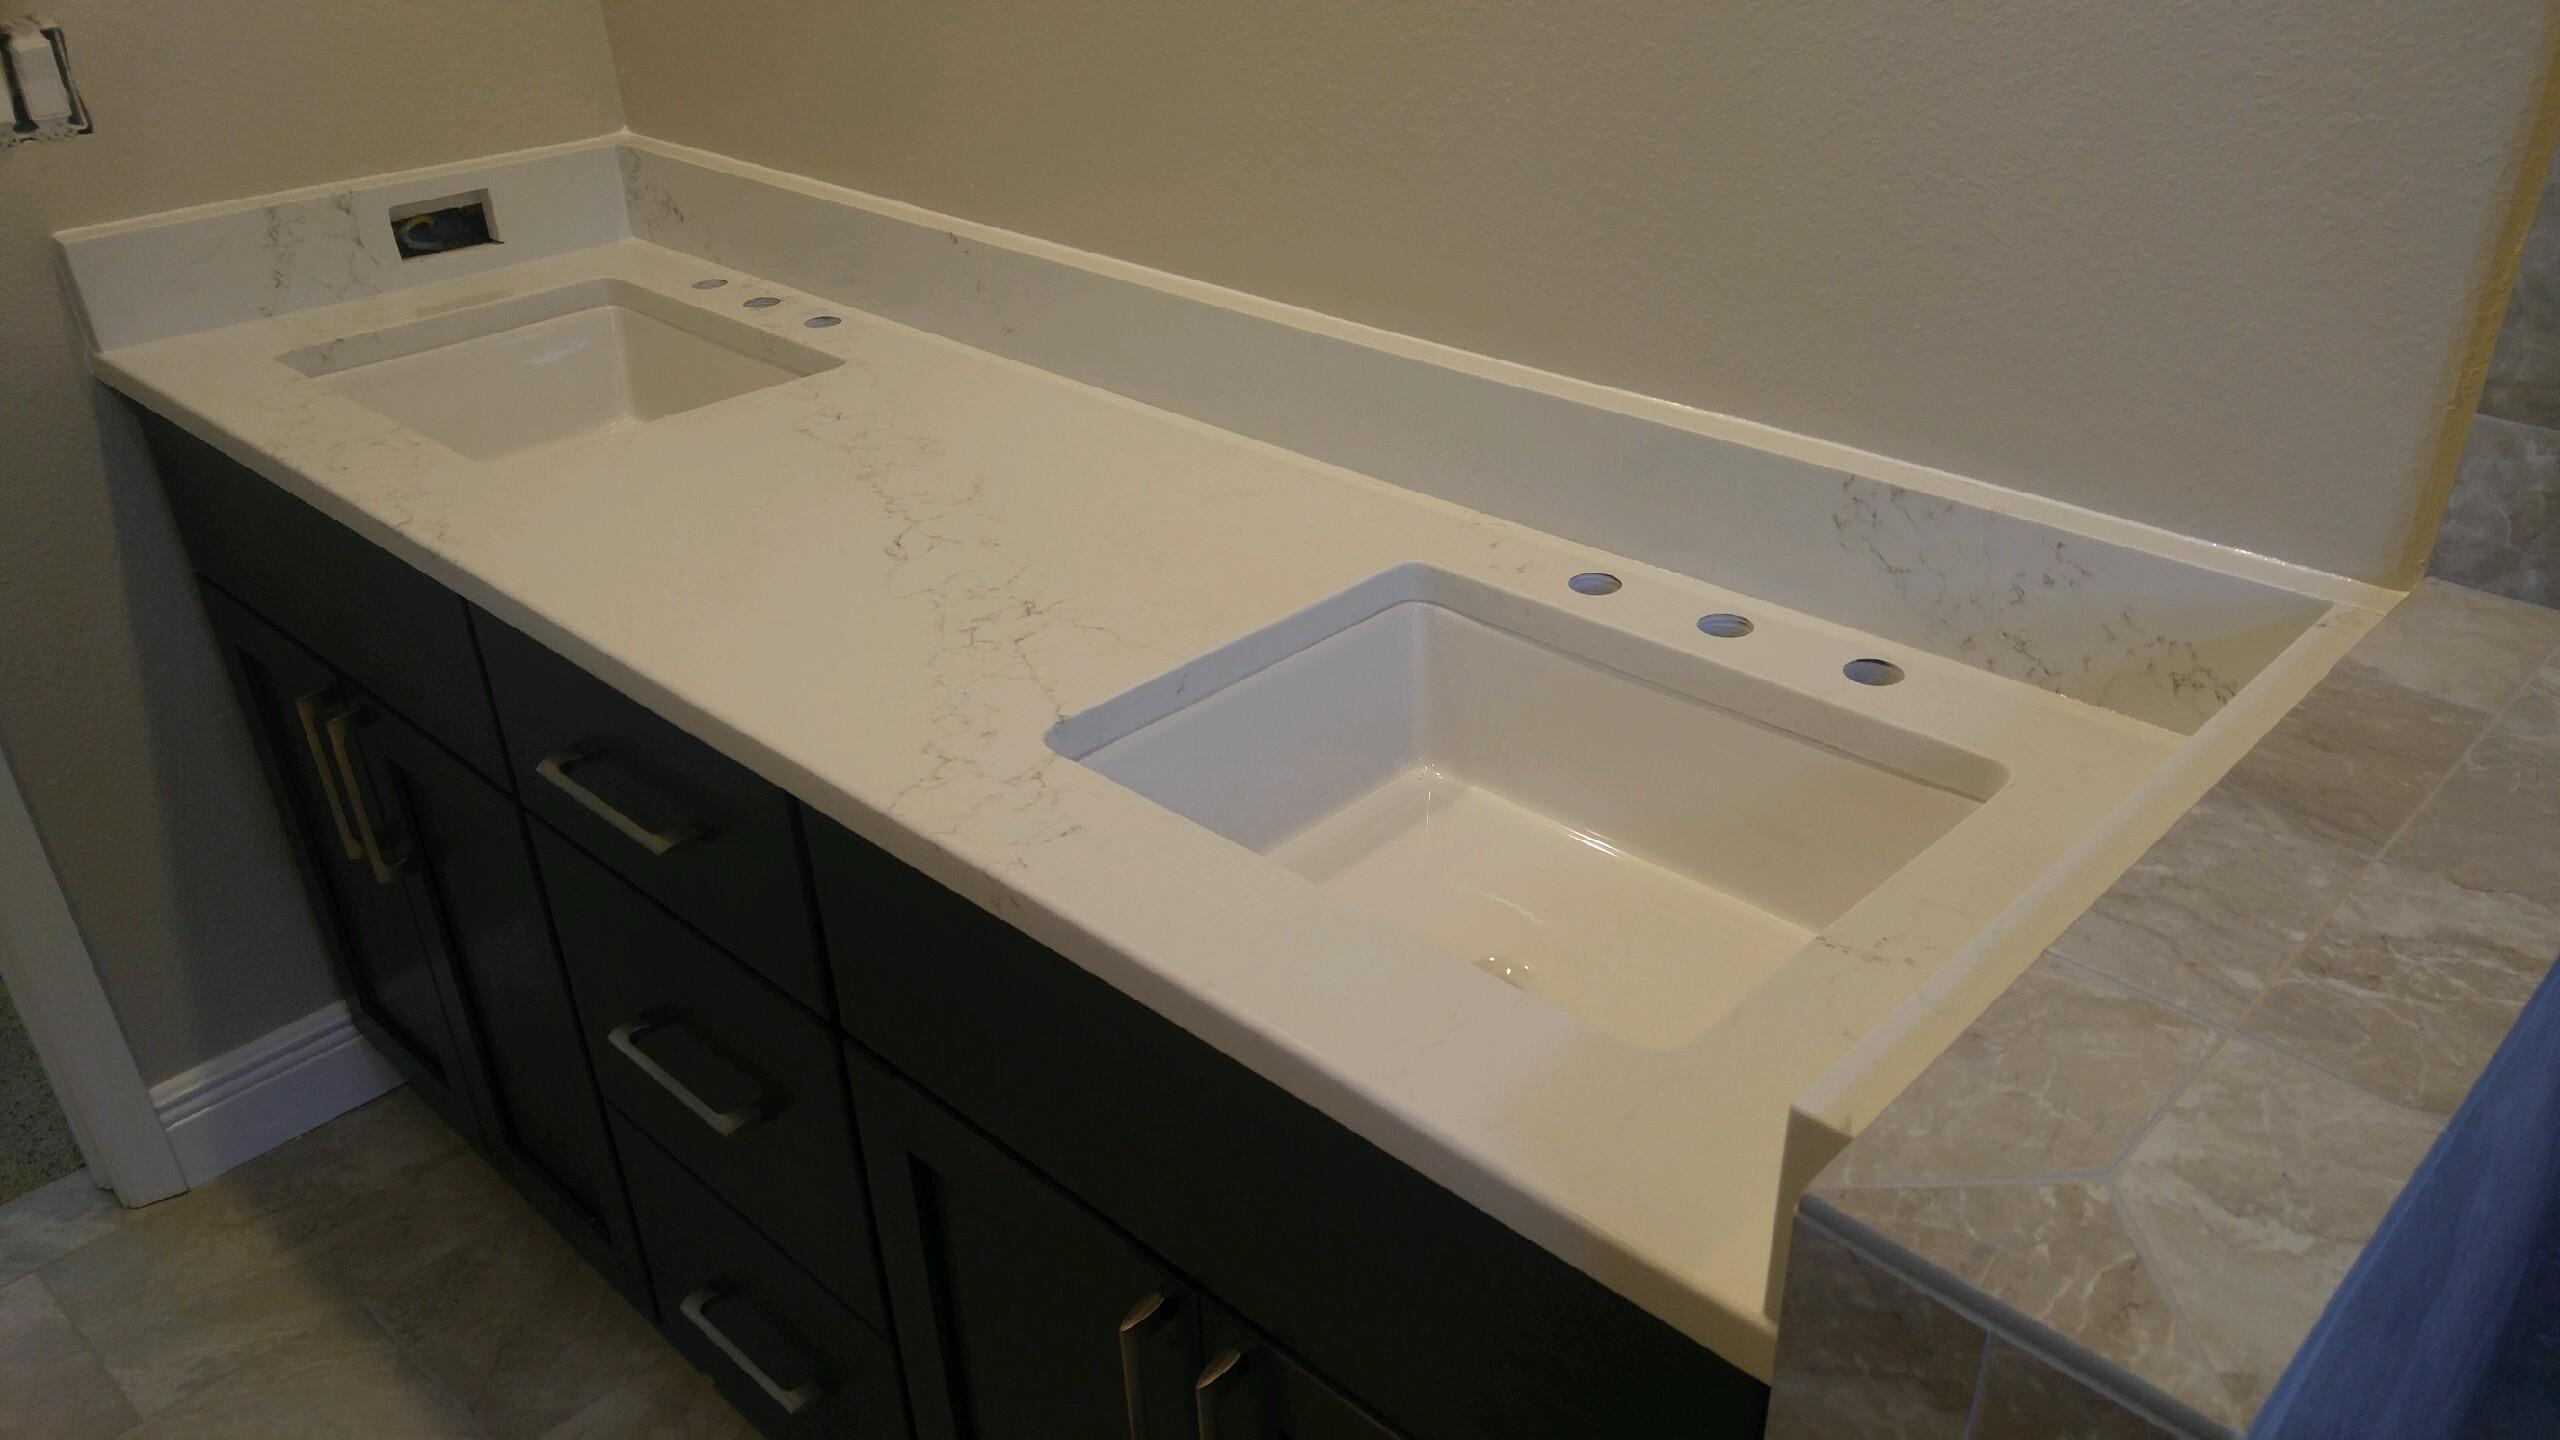 Pompeii Misterio Quartz Bathroom Vanity Countertop Remodel In Tampa Fl